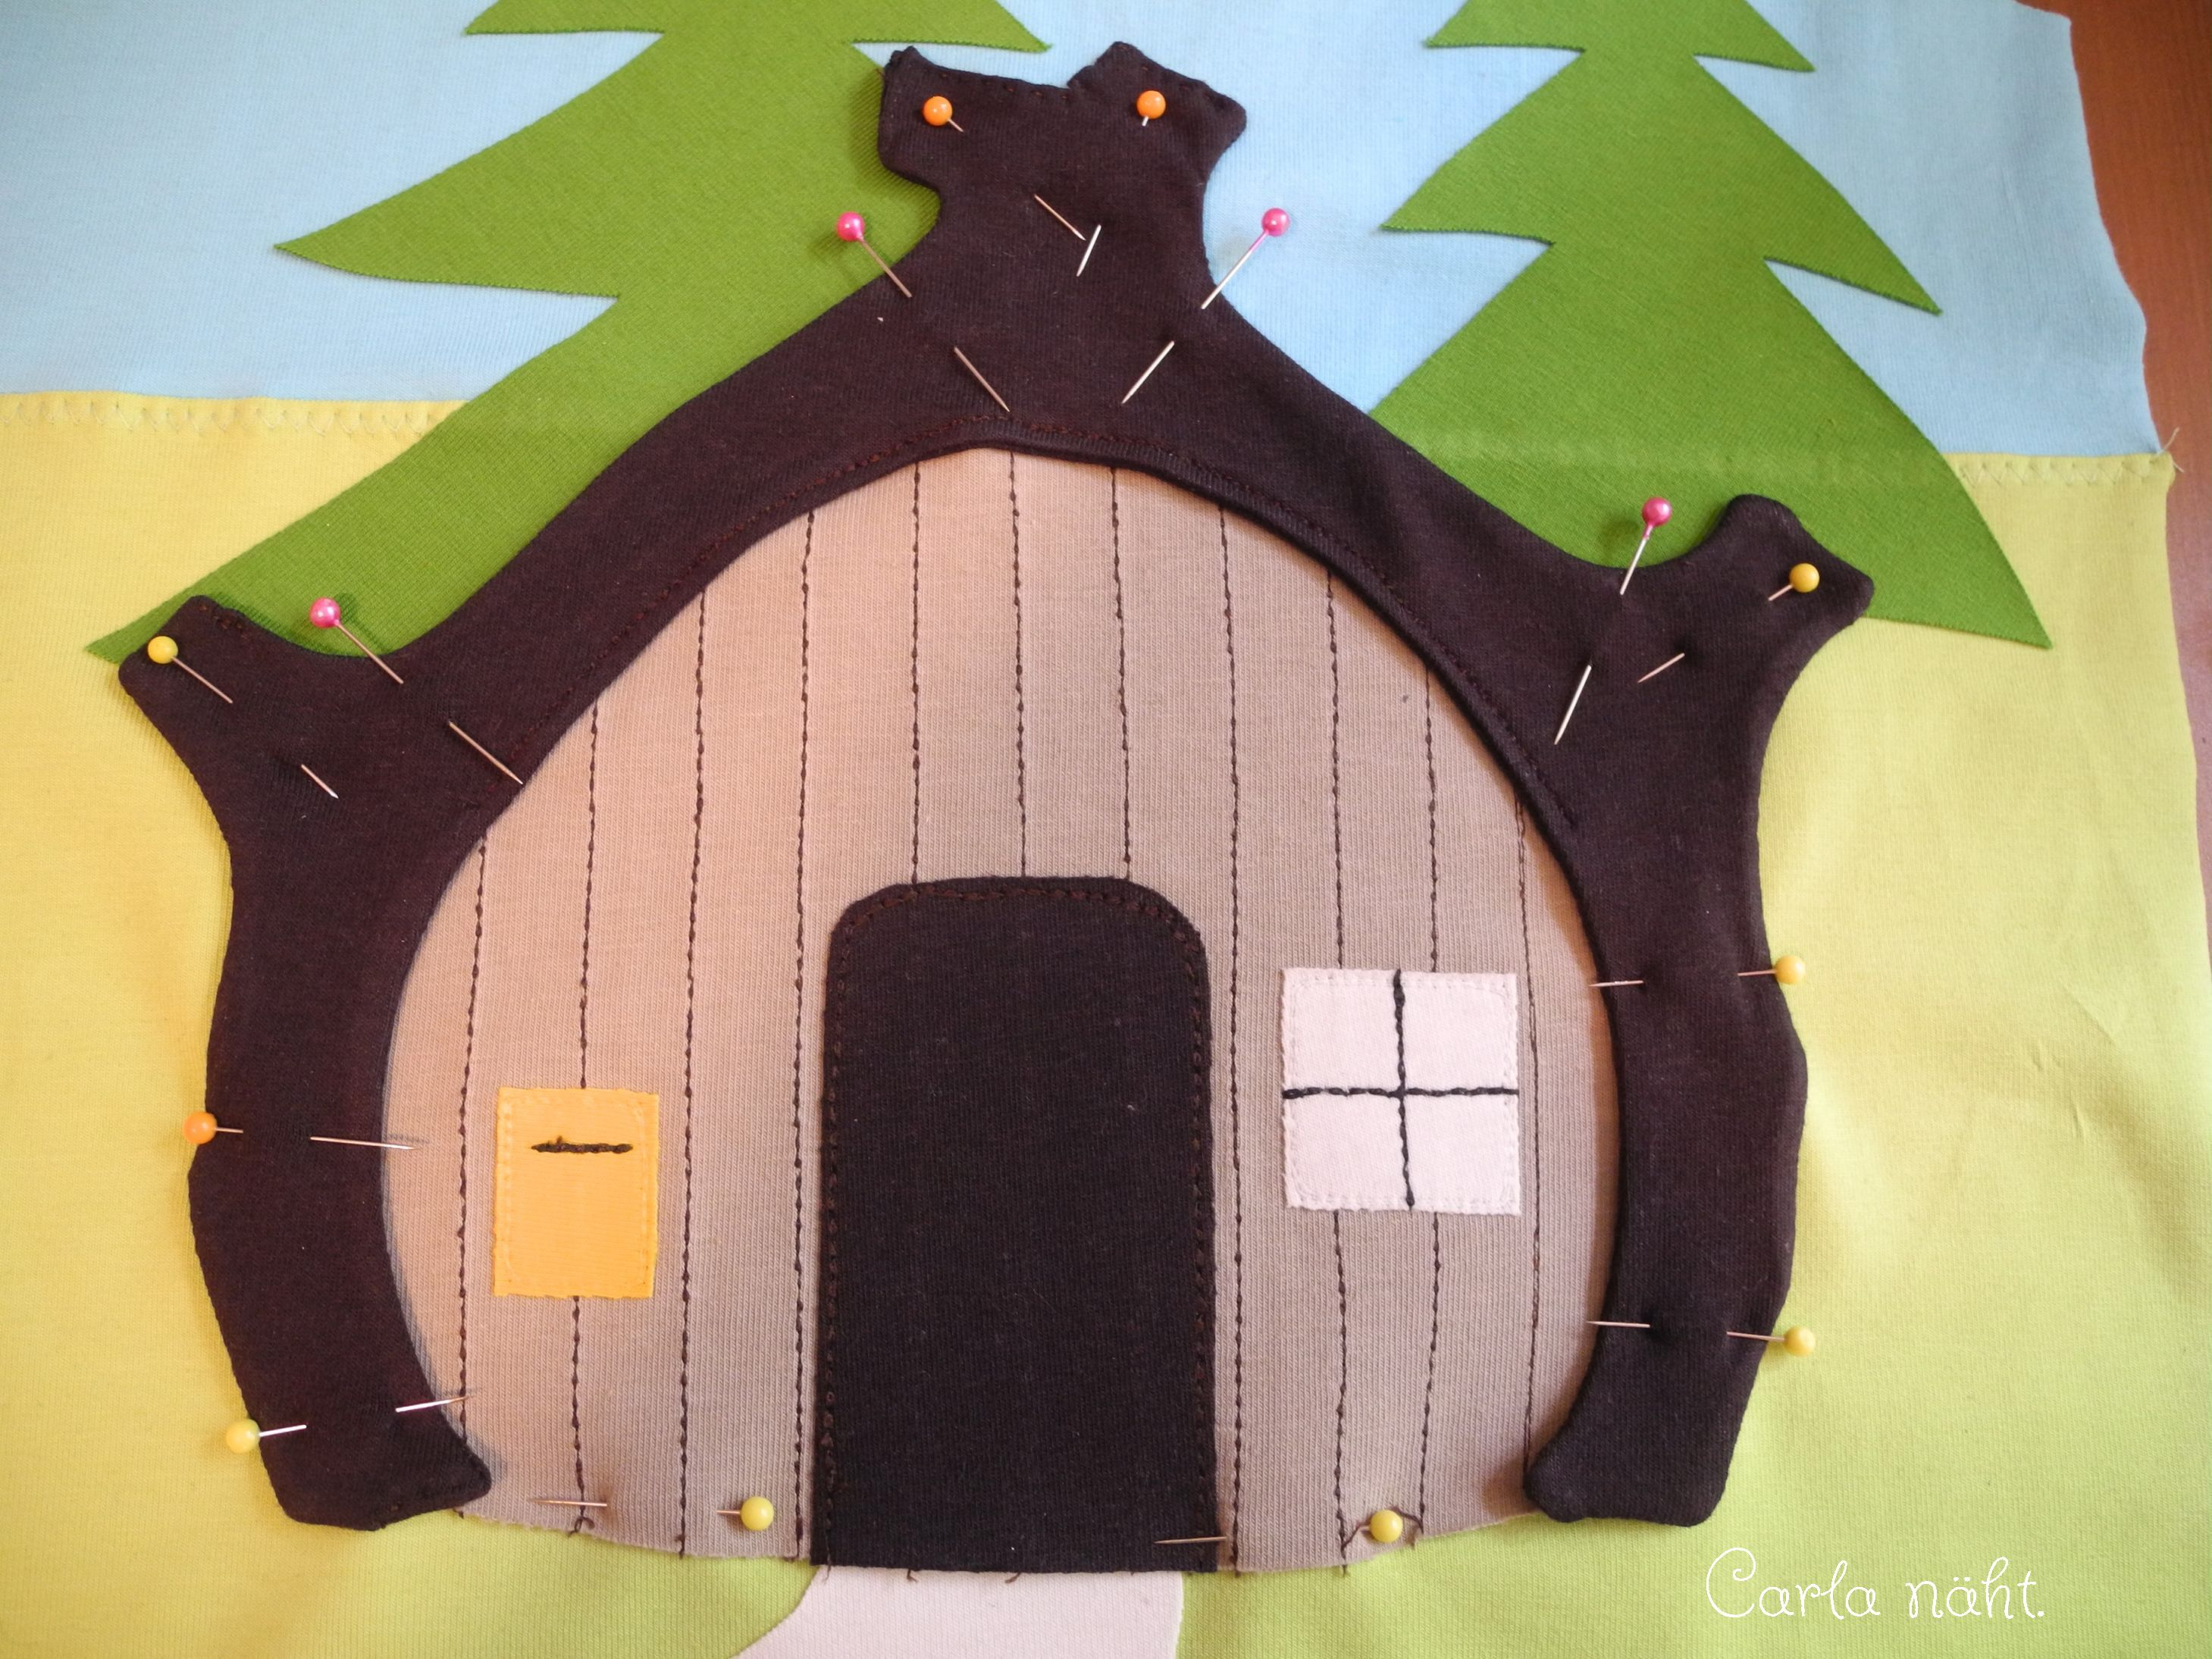 Mascha & der Bär zum dritten Geburtstag! | Bären, Applikationen ...